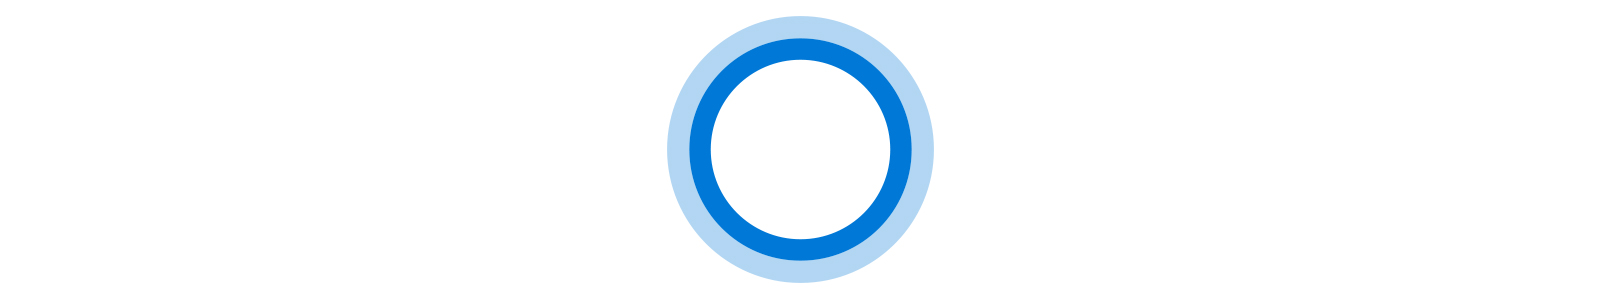 Cortana Animated Icon